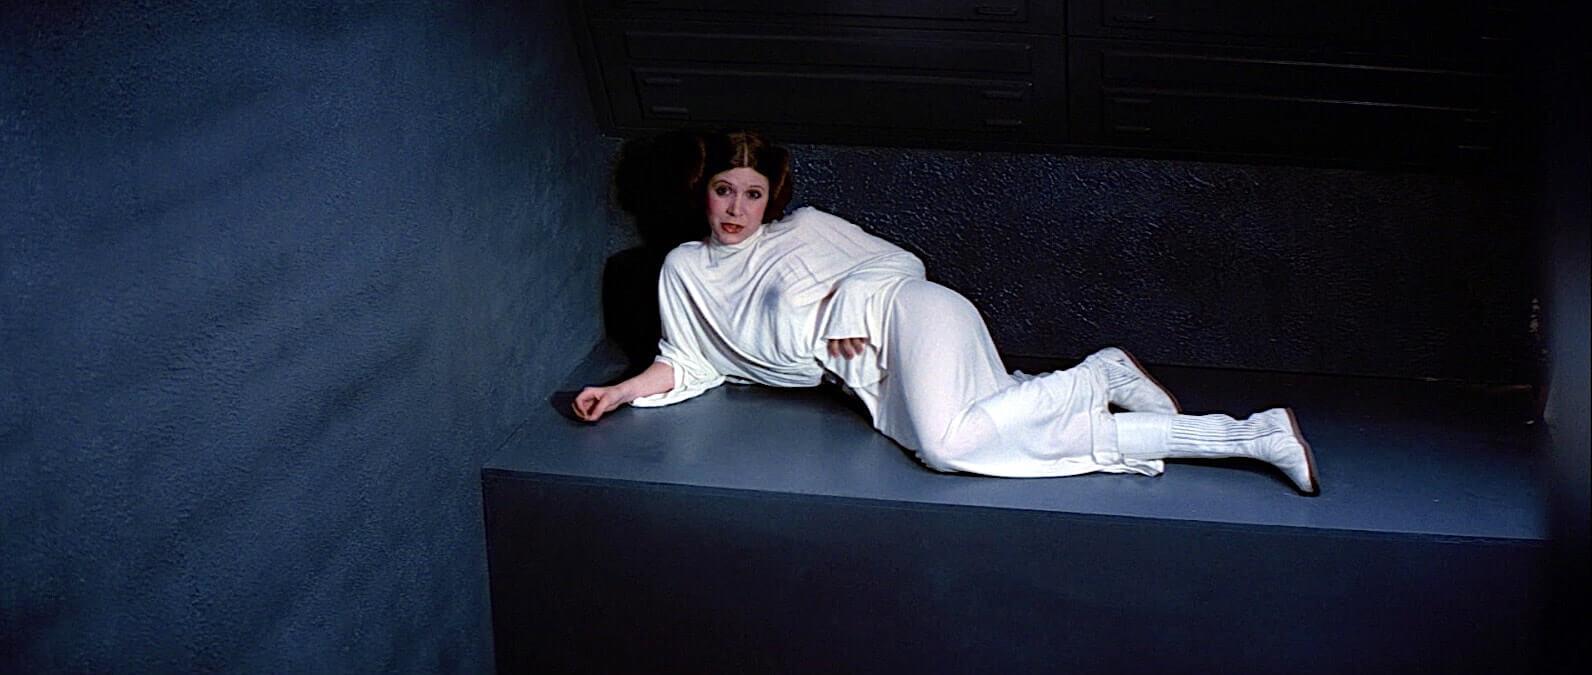 How to Write a Story Outline - Free Script Template - Princess Leia Star Wars